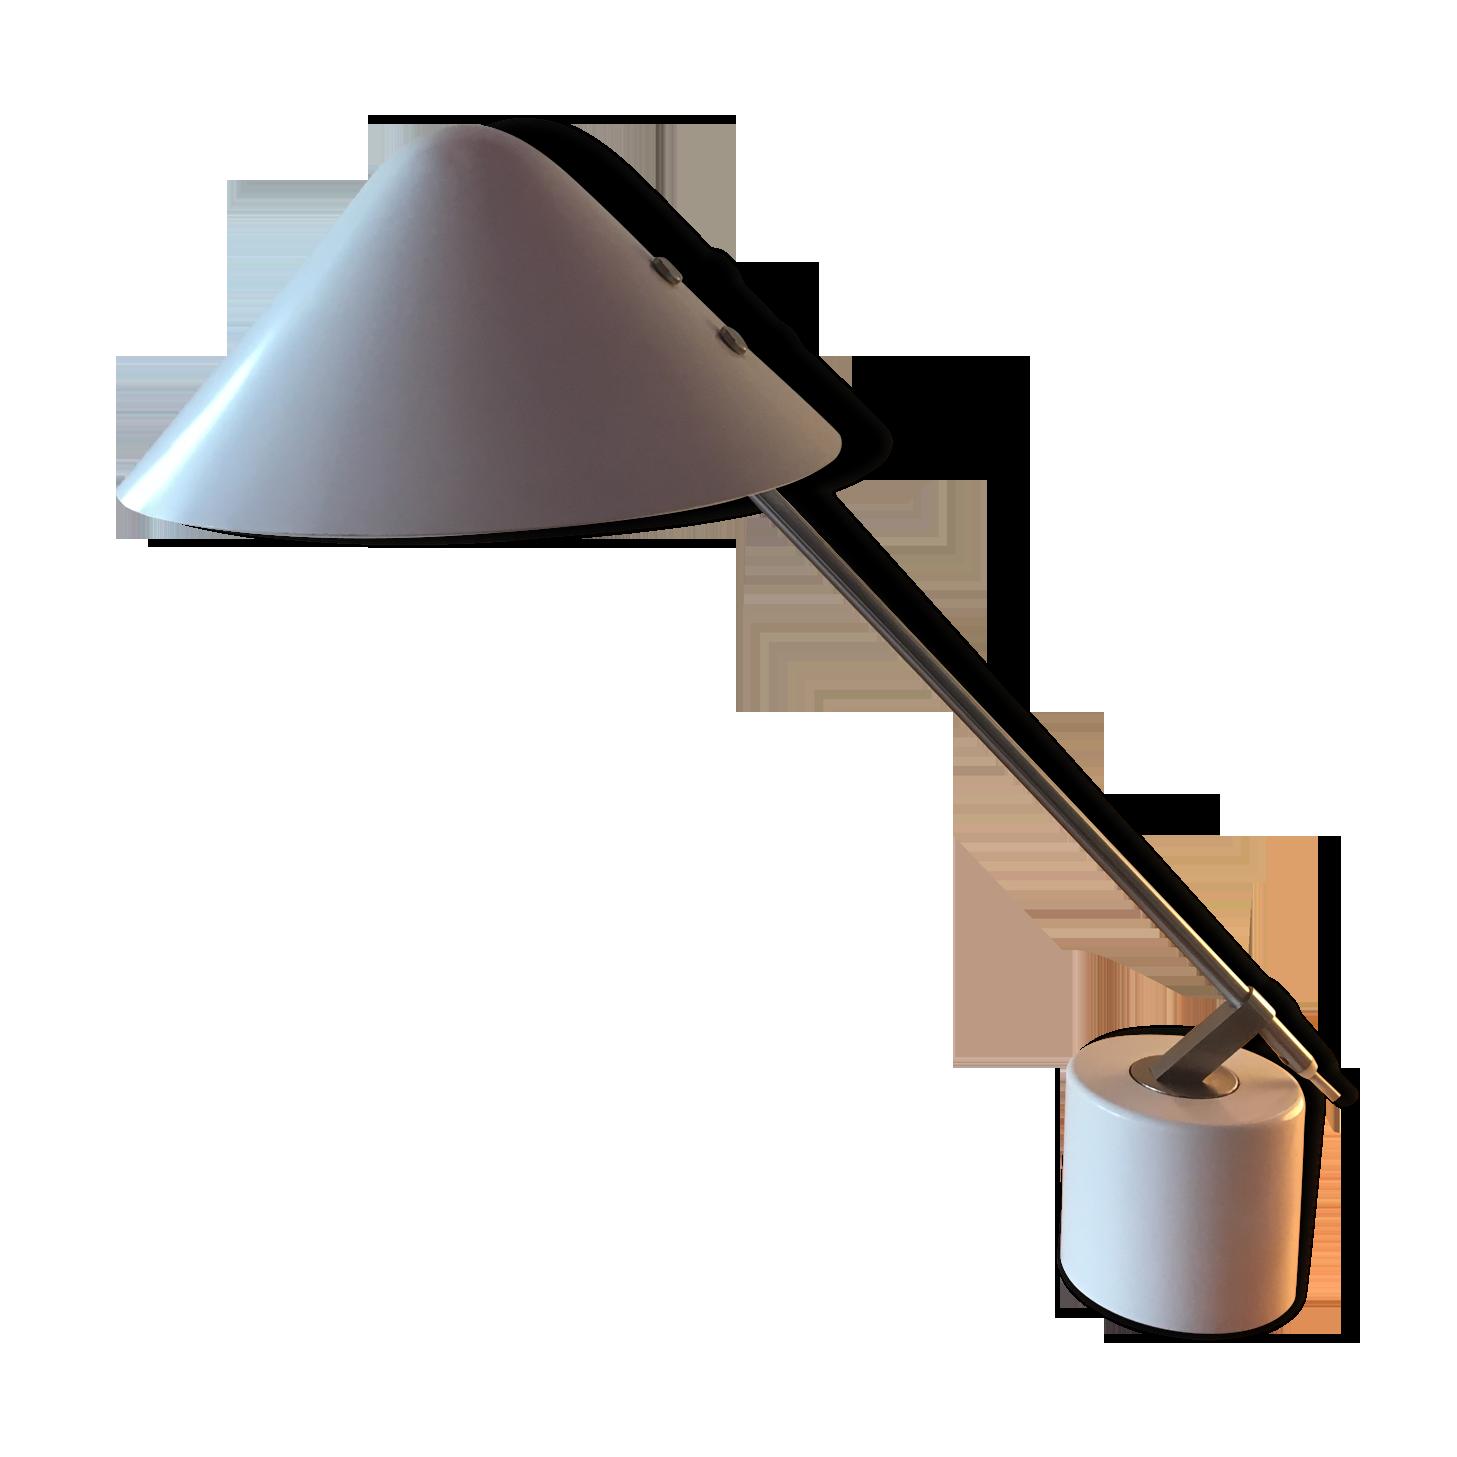 Lampe de bureau jorgen gammelgaard originale design métal